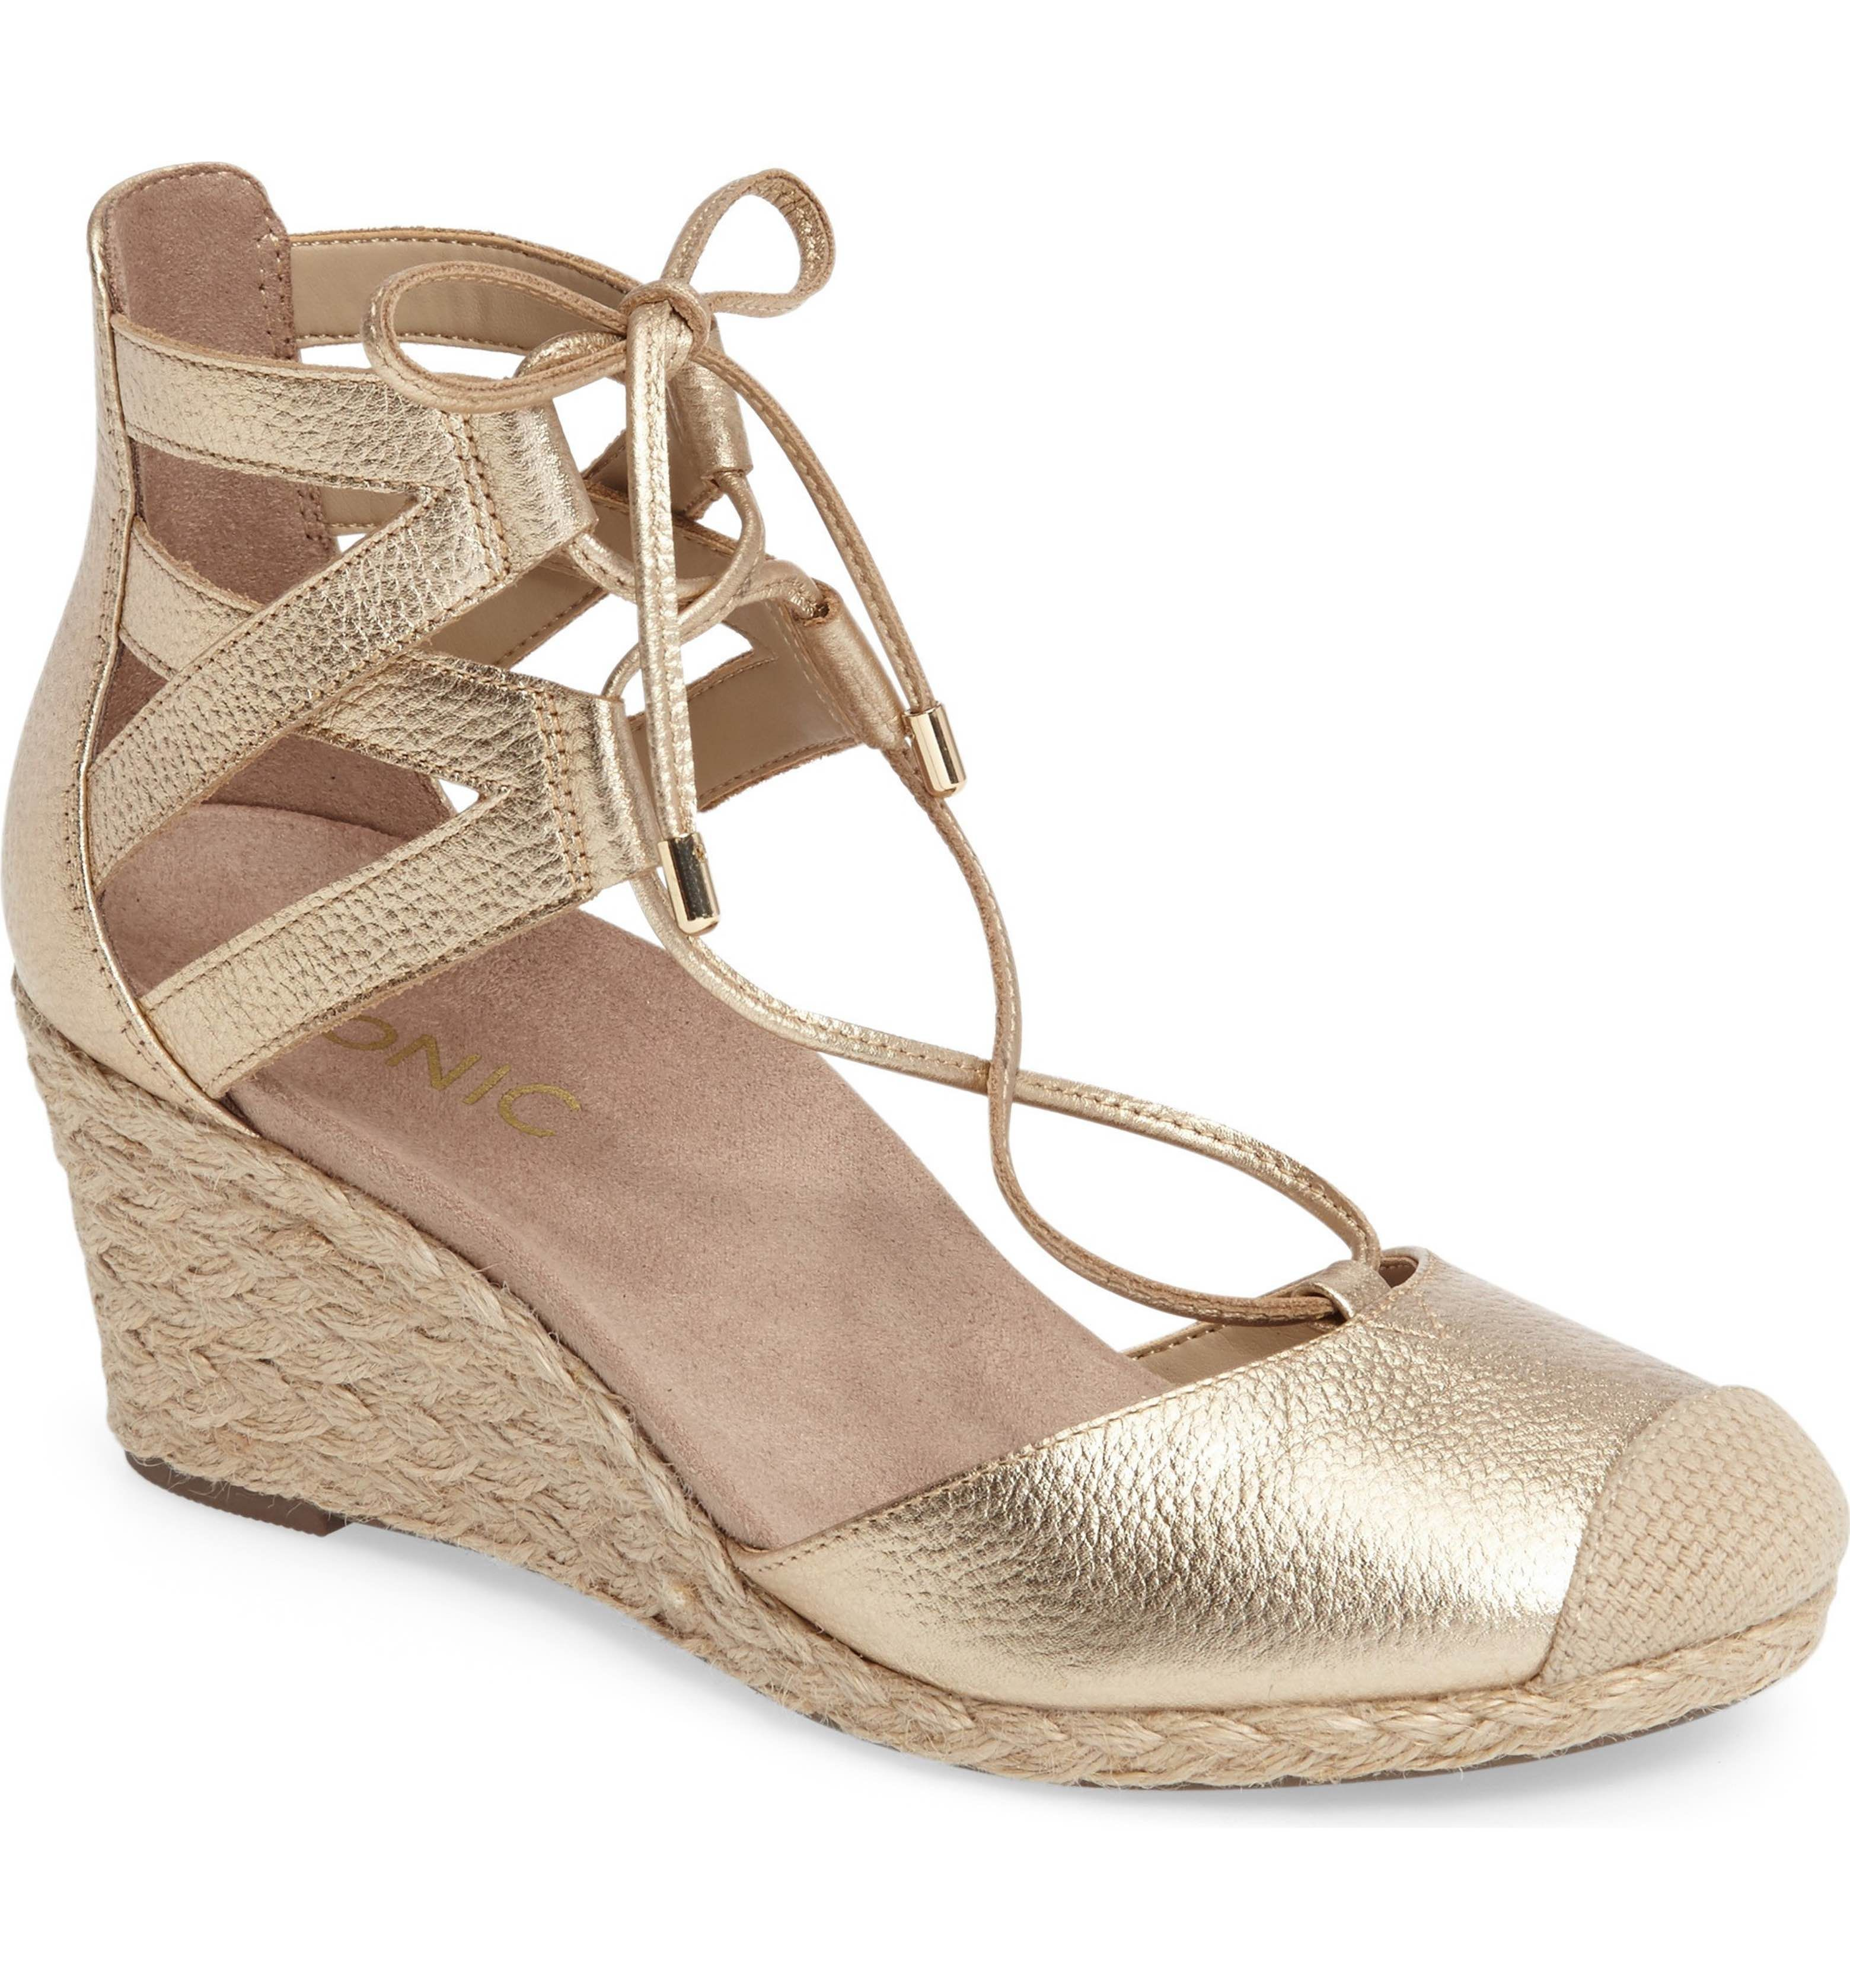 08523a7ceec Main Image - Vionic Calypso Wedge Sandal (Women)